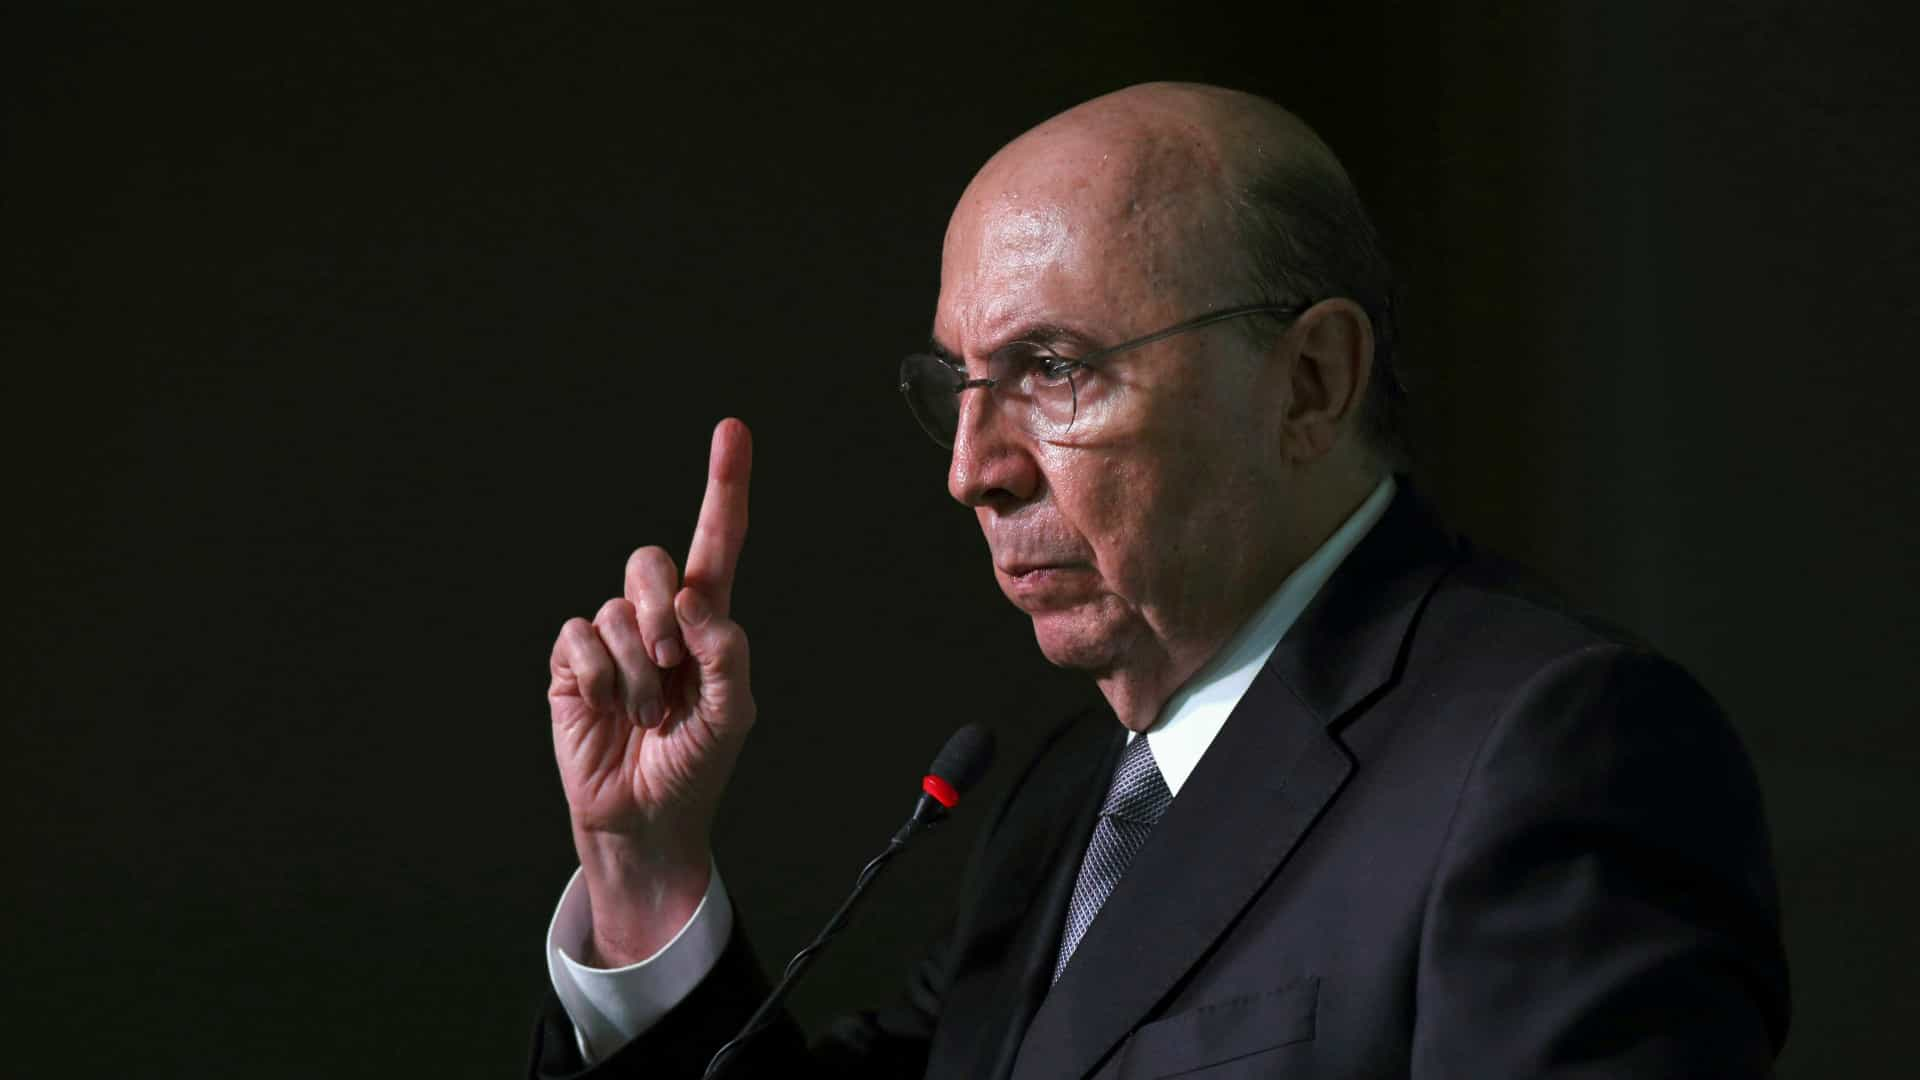 Meirelles diz haver 'planos concretos' de investidores para o Brasil